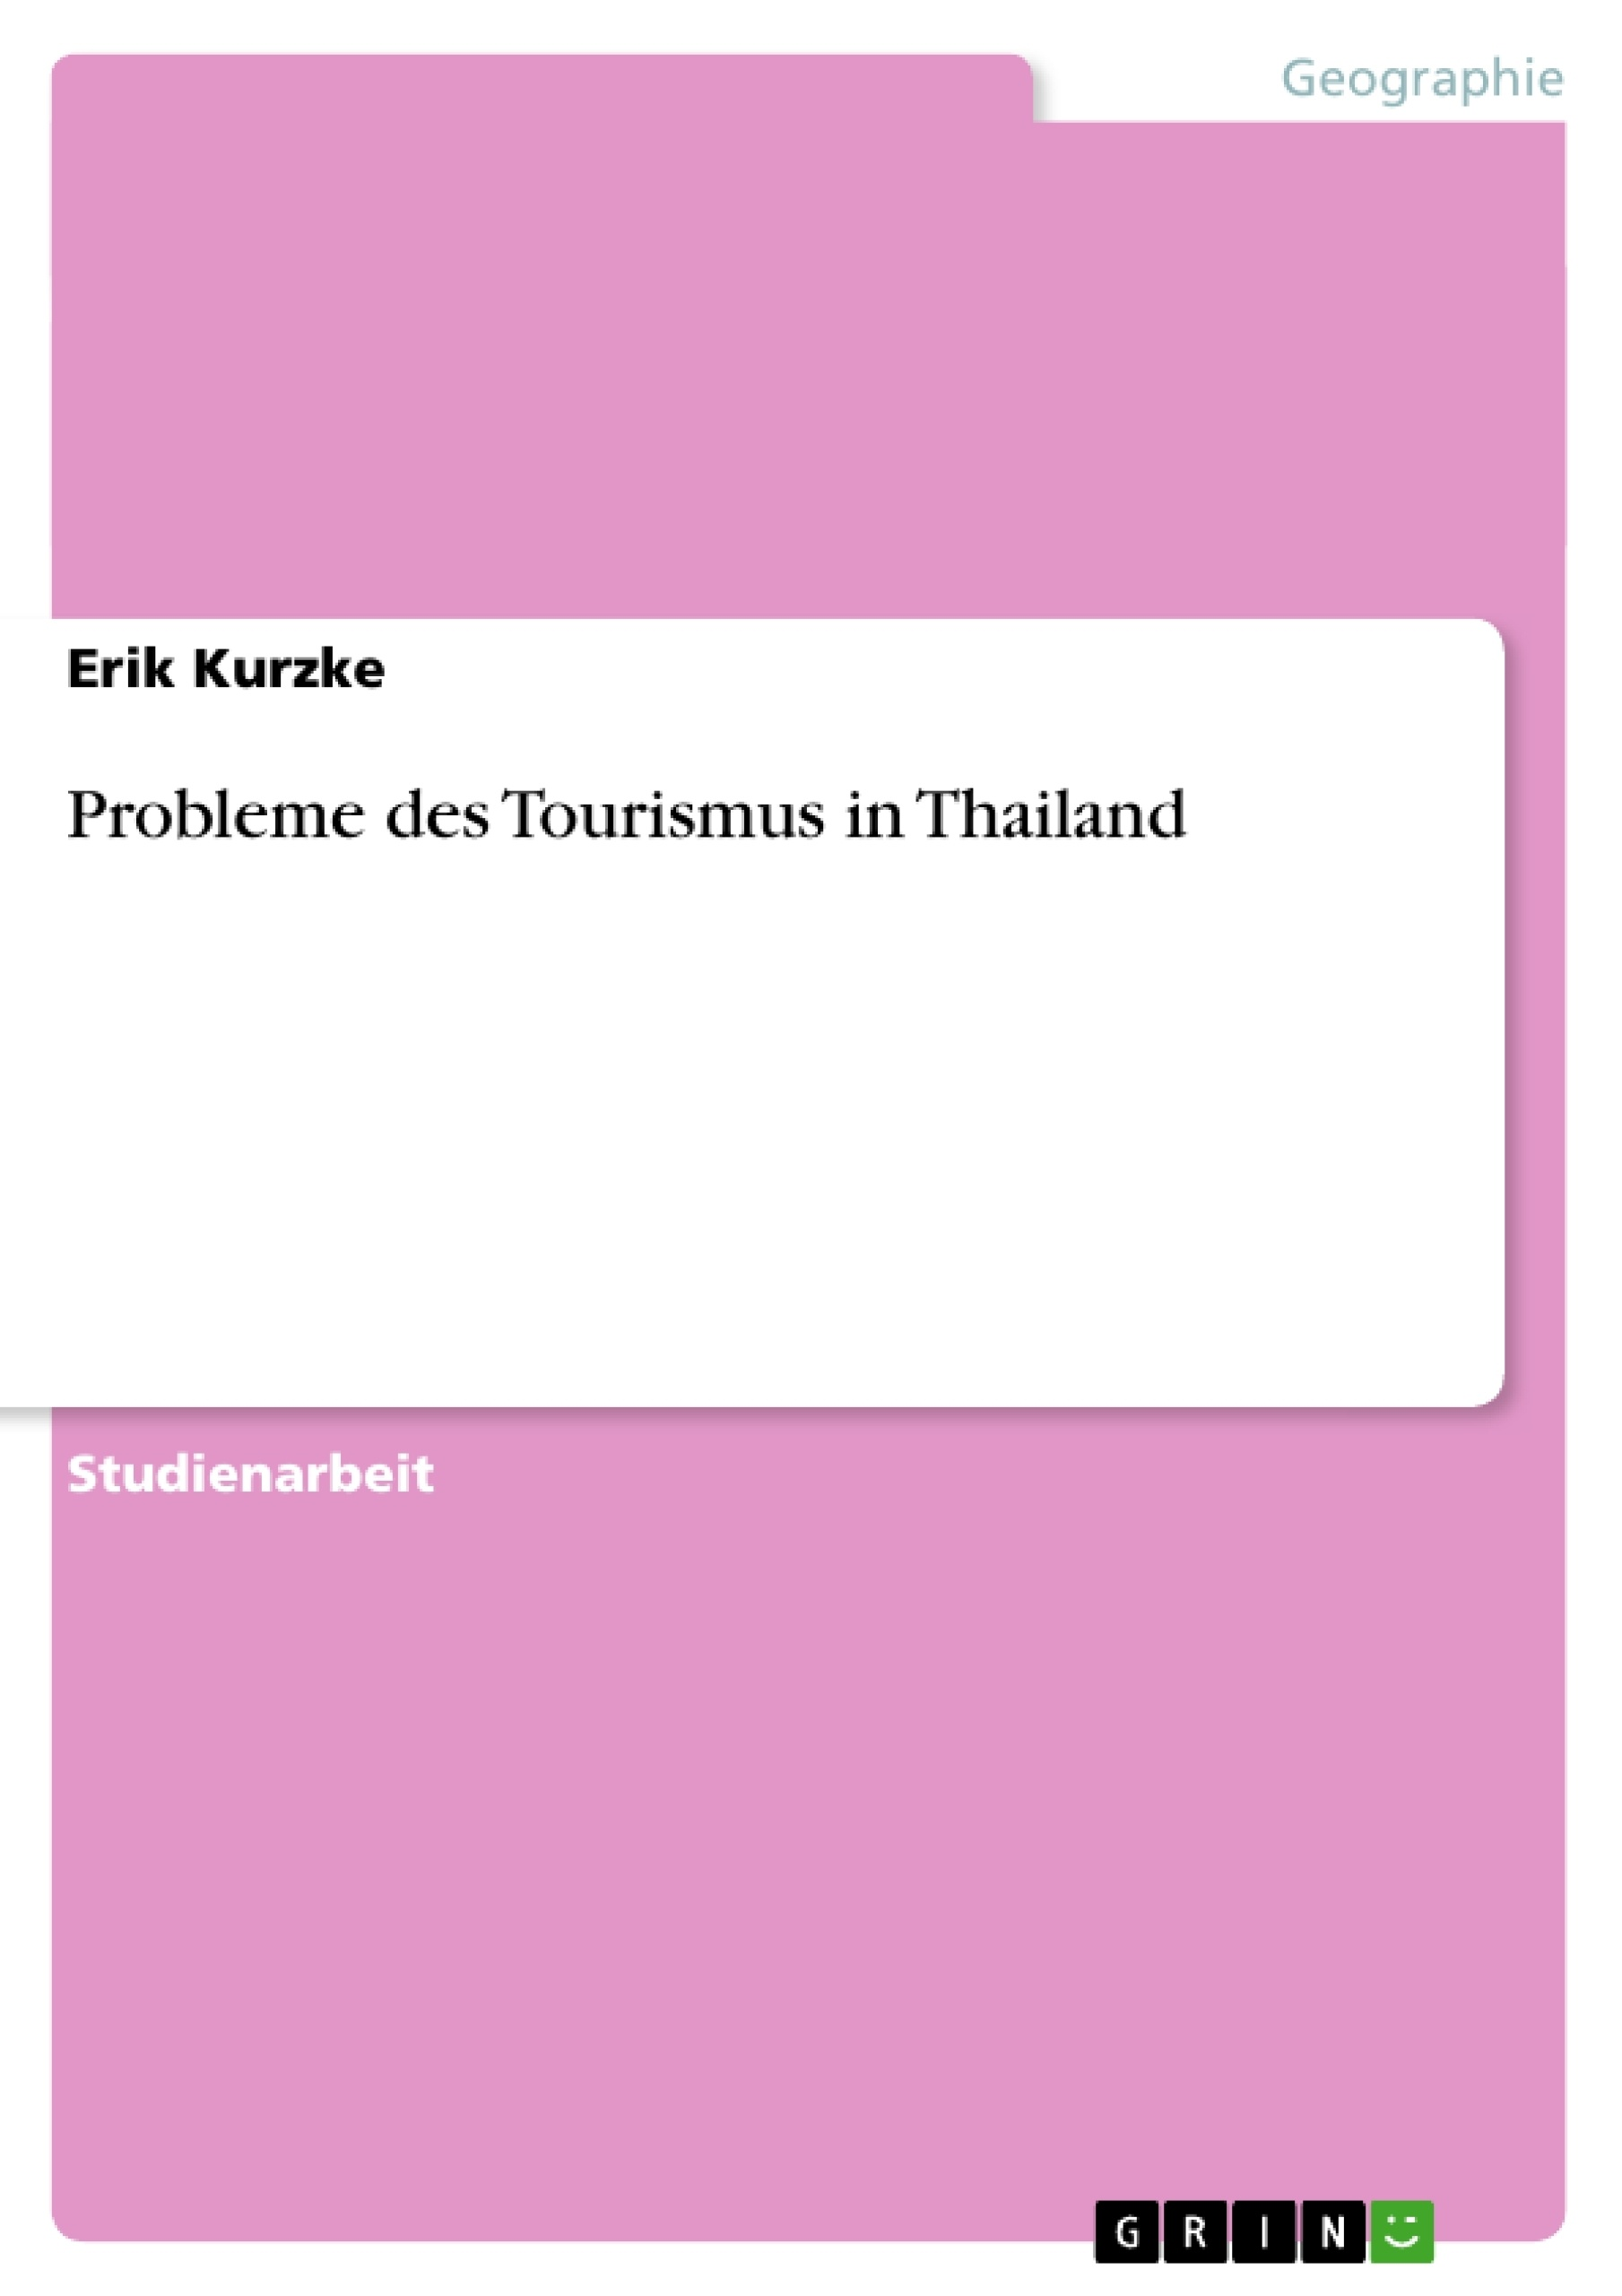 Titel: Probleme des Tourismus in Thailand